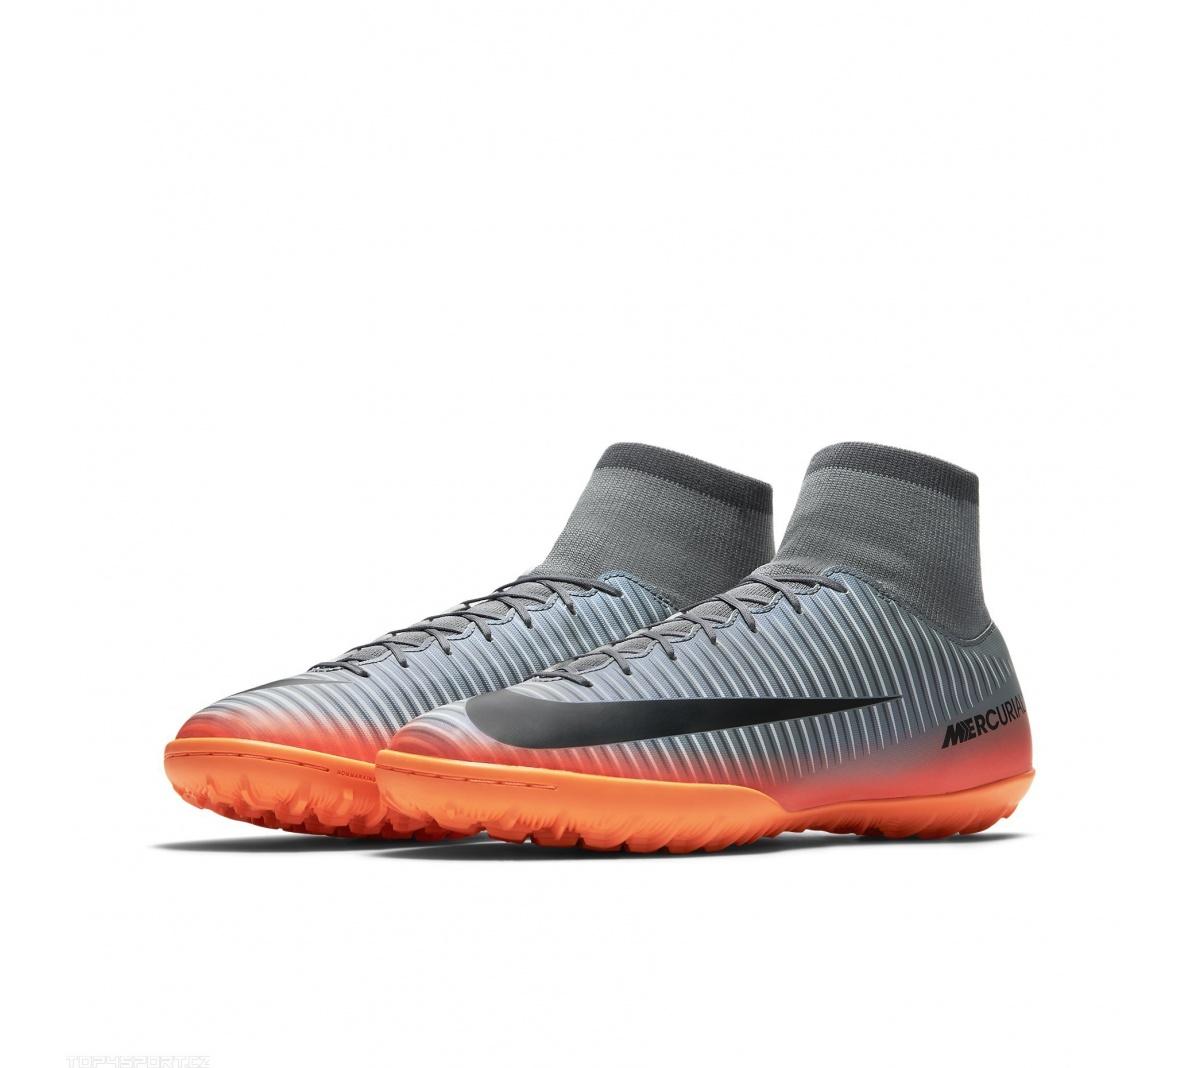 Chuteira Nike Mercurial CR7 DF Society - Mundo do Futebol 83d7b2c0176dc